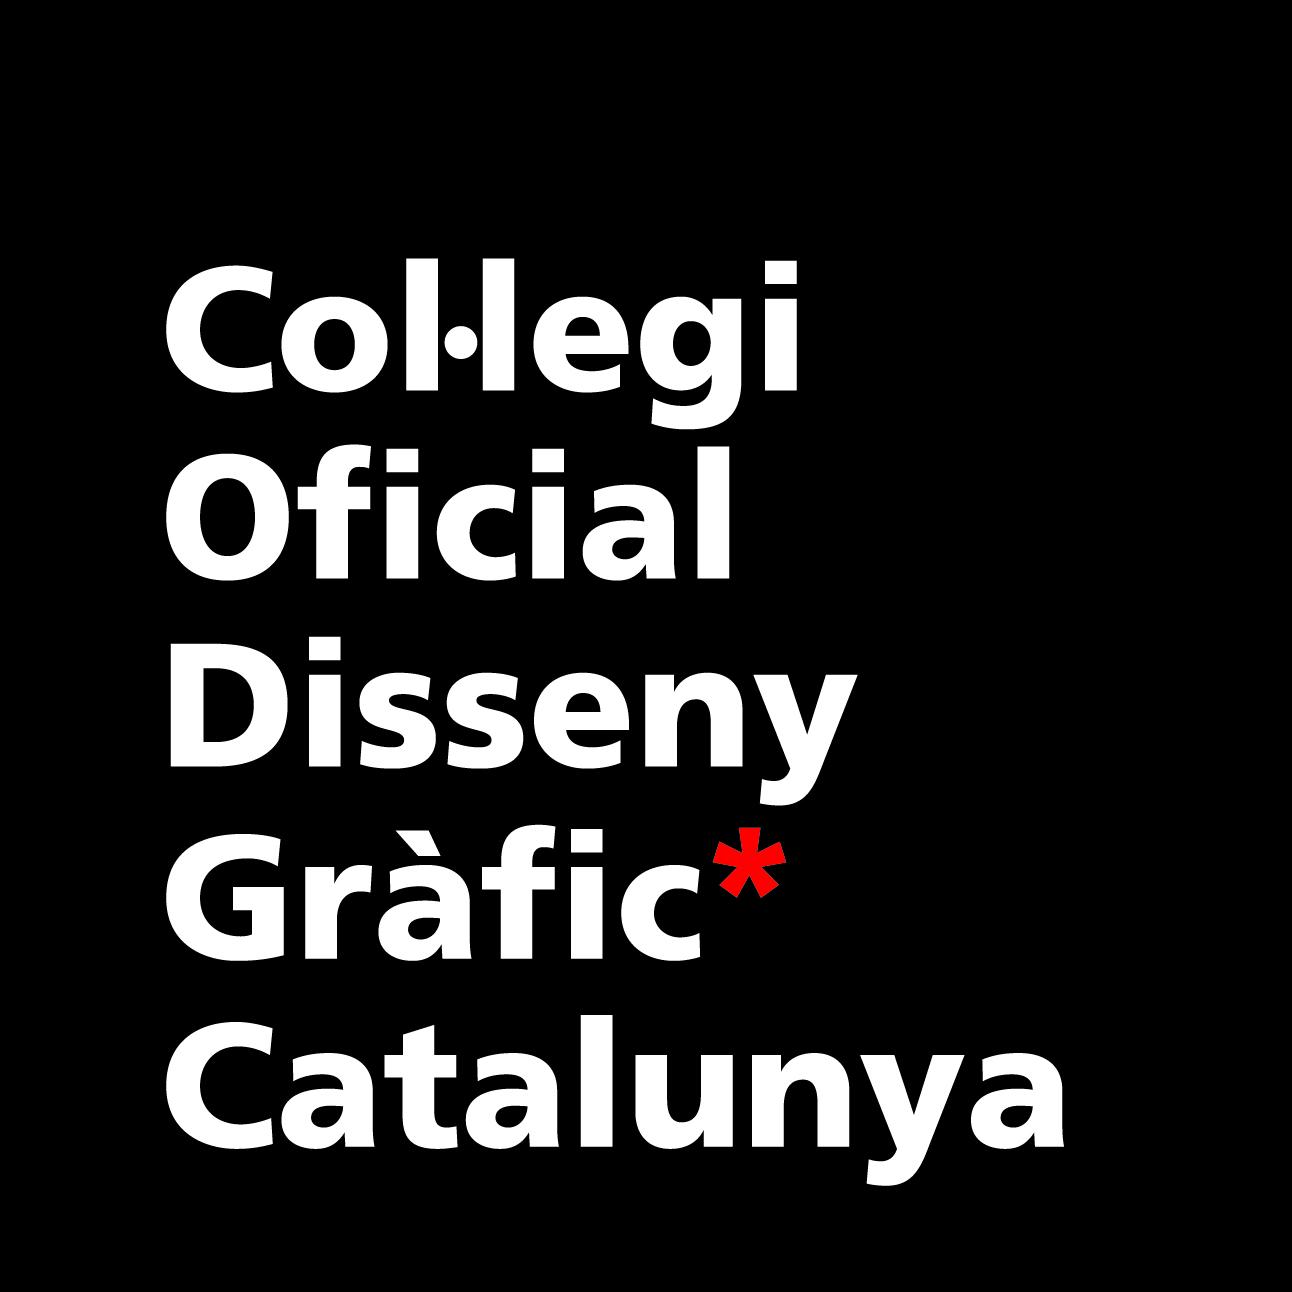 Col.legio Oficial Dissseny Gràfic Catalunya